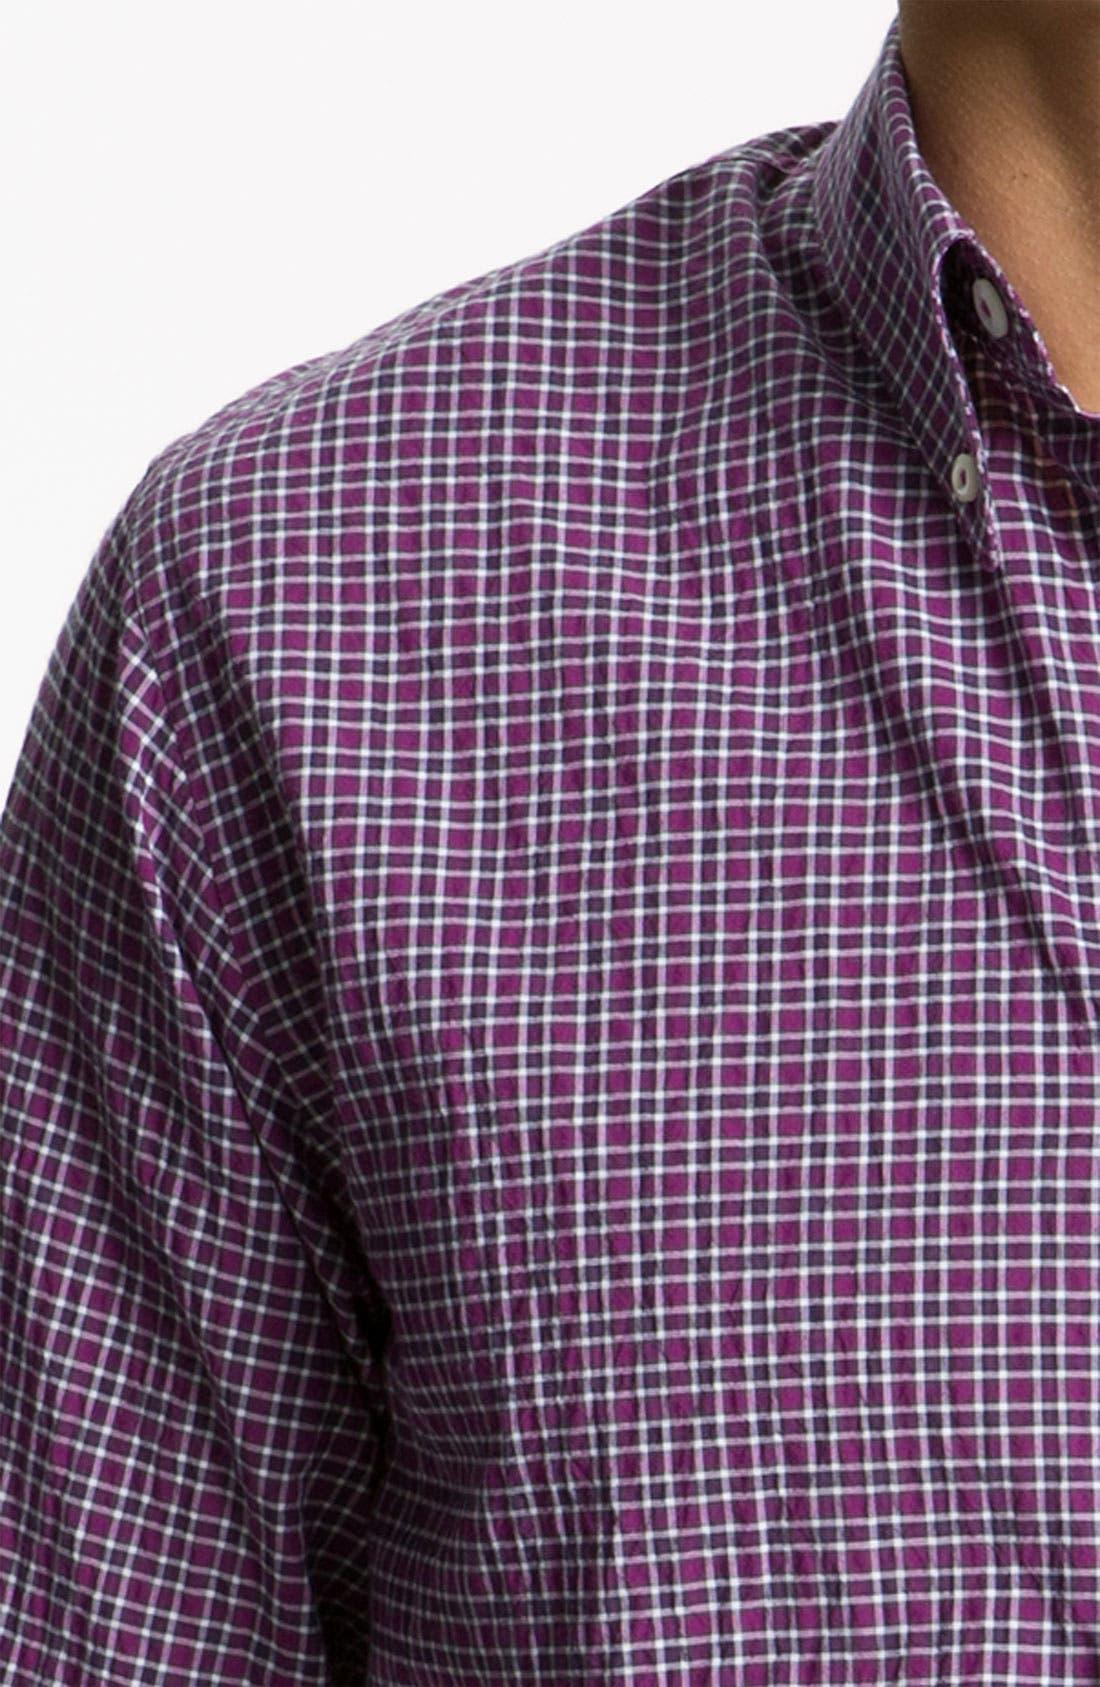 Alternate Image 3  - Billy Reid 'Tuscumbia' Plaid Woven Shirt